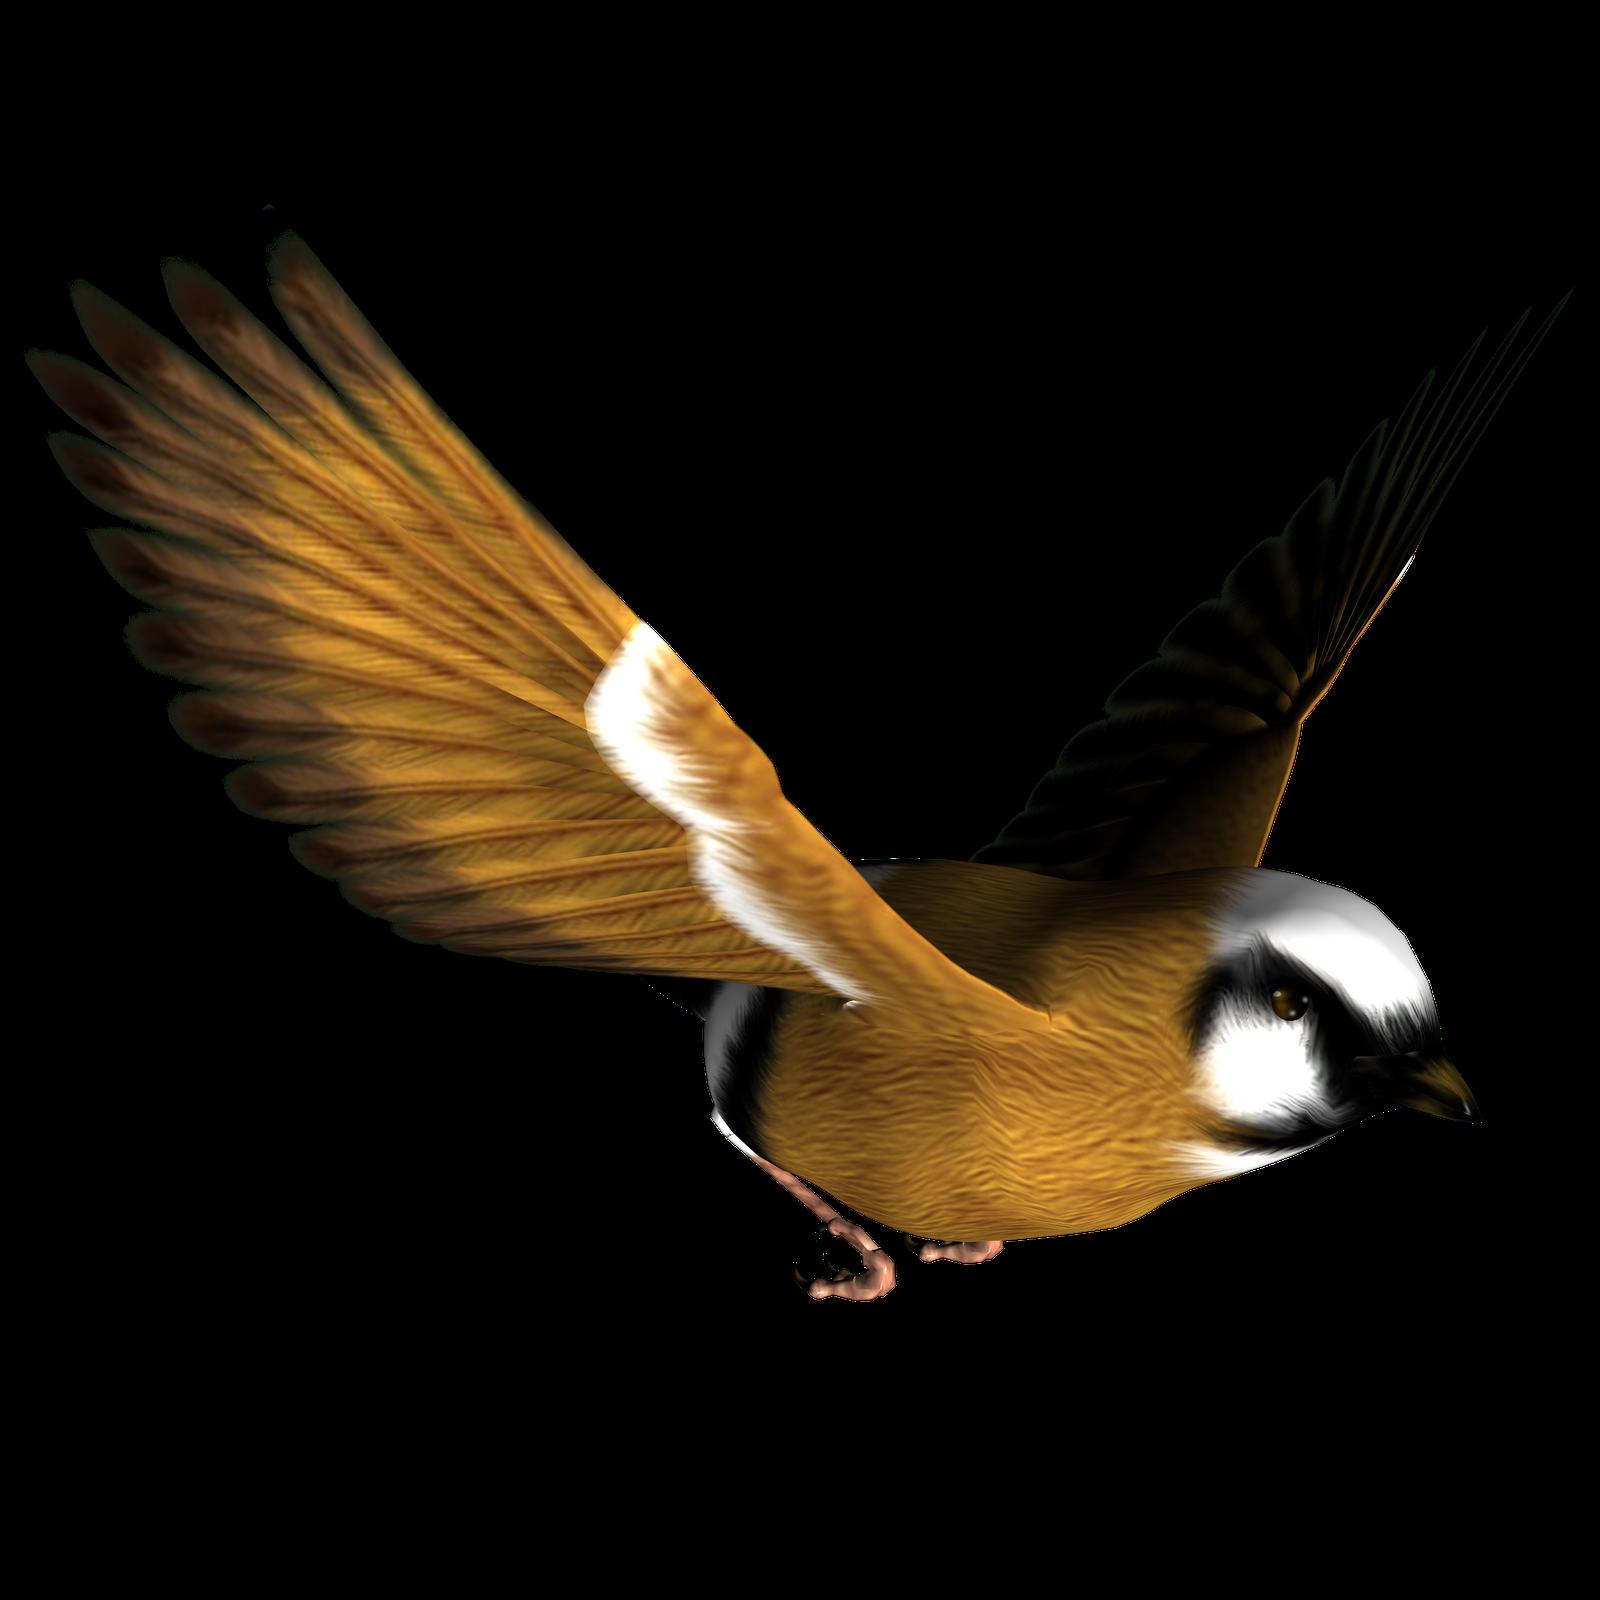 Pigeon clipart burung. Birds transparent png pictures